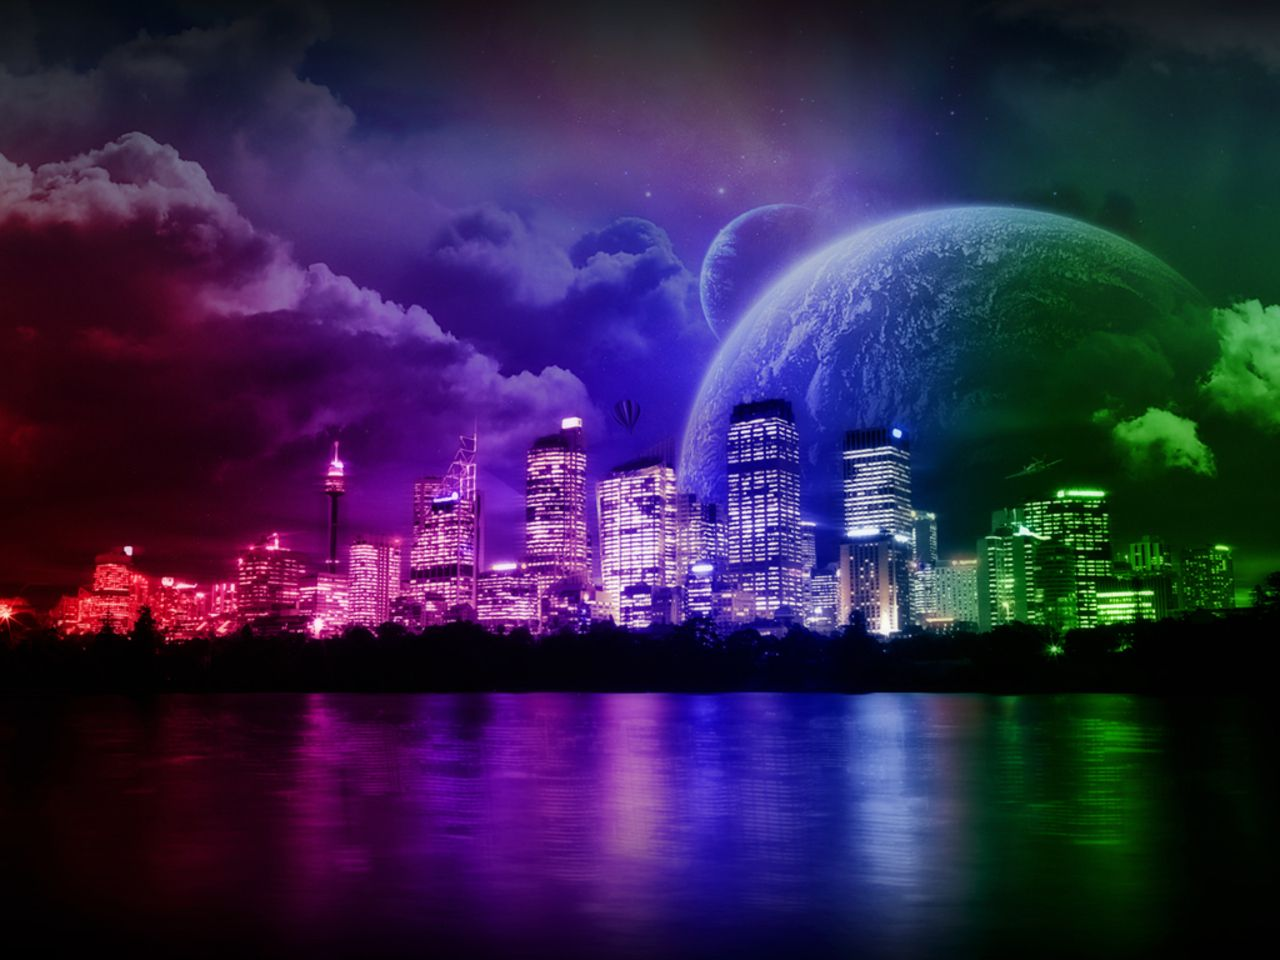 Bright Colors Wallpaper Cosmic Colors Rainbow City World Wallpaper Night City